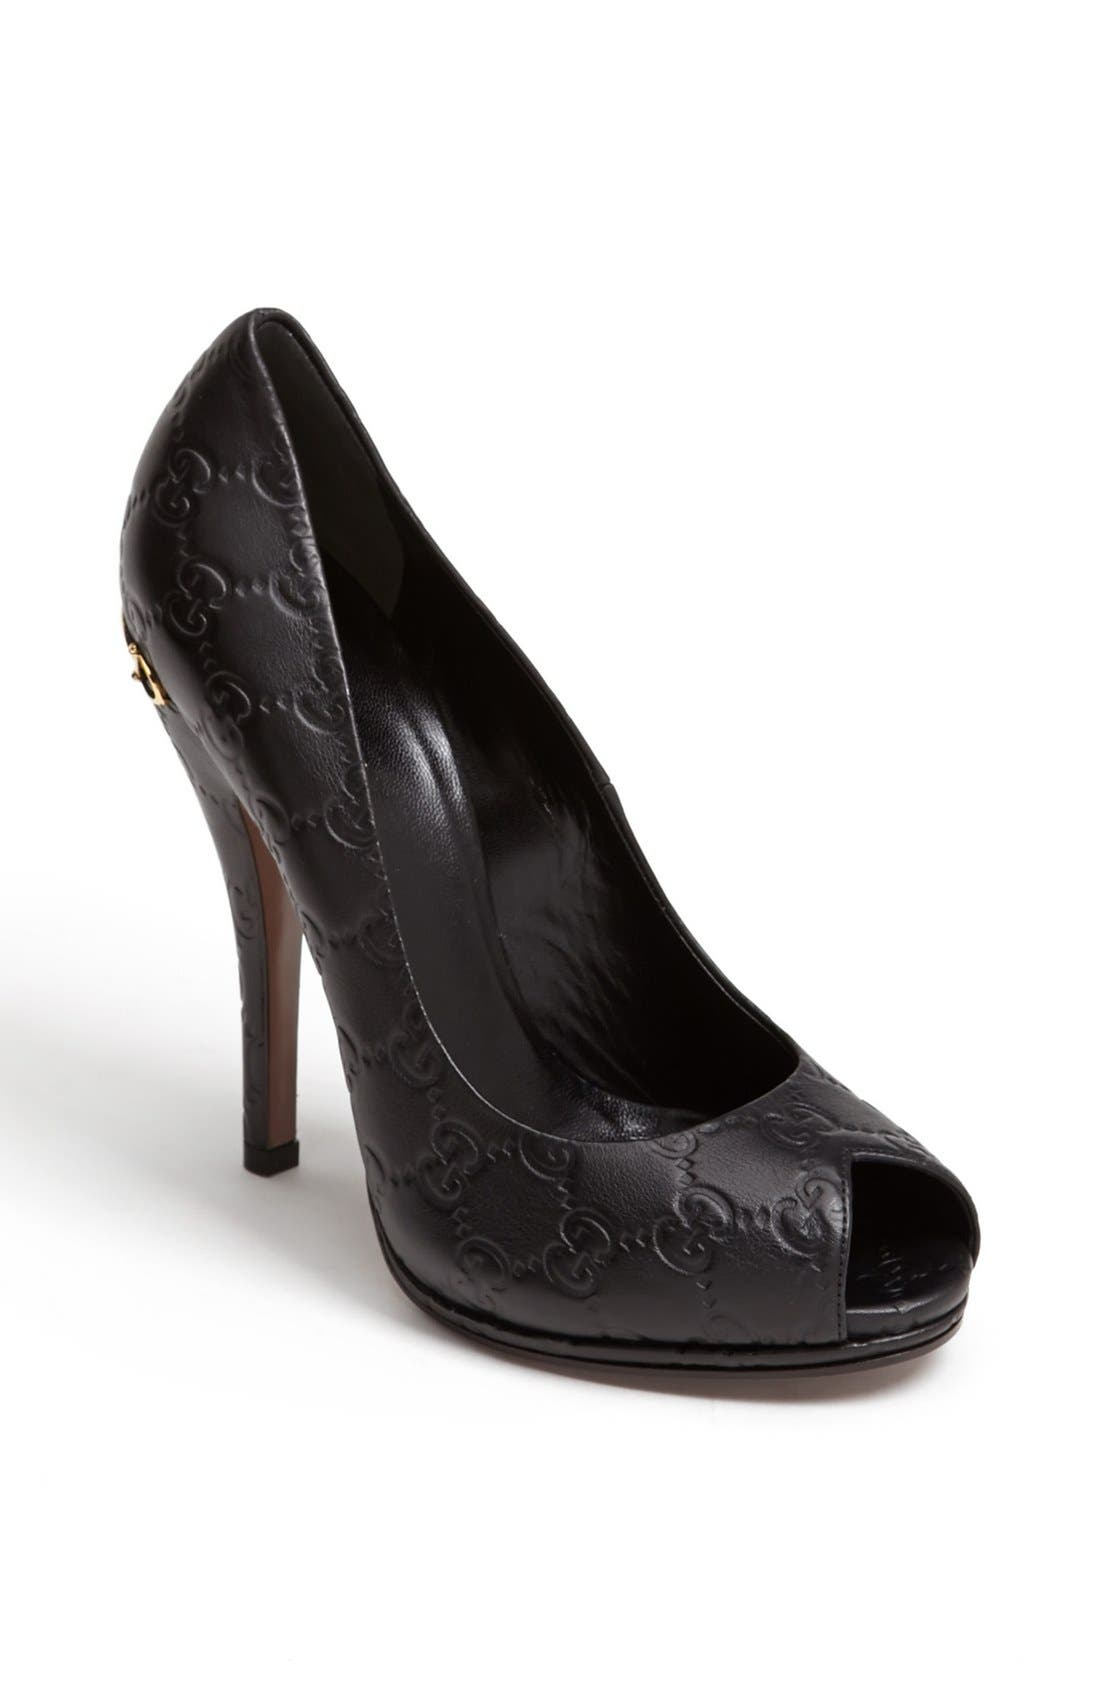 Main Image - Gucci 'Elizabeth' Peep Toe Pump